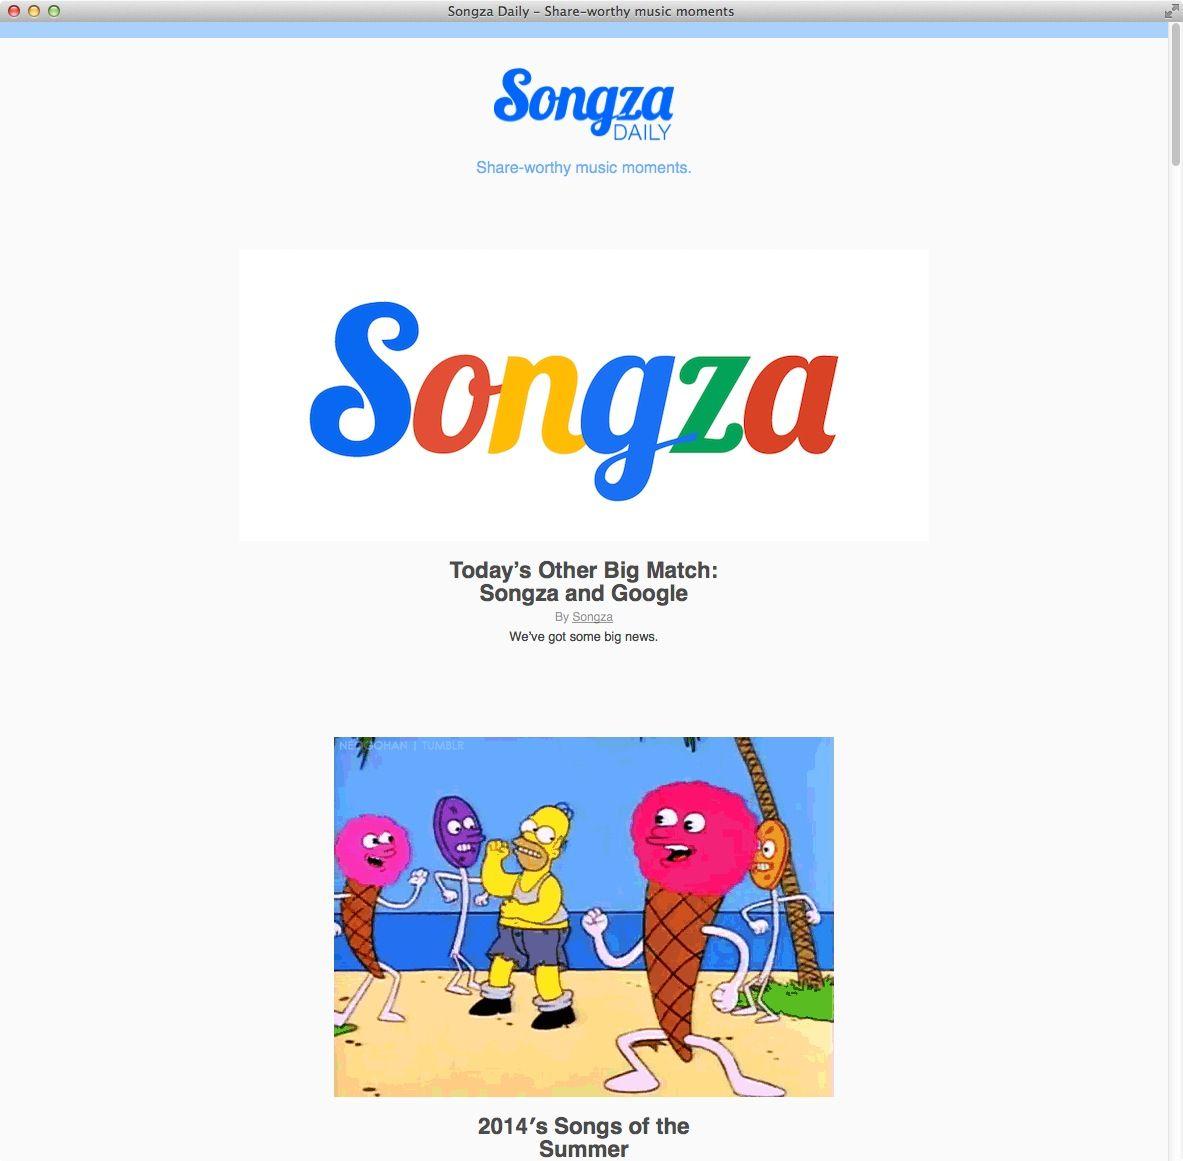 NUR ALS ZITAT Screenshot Songza Daily